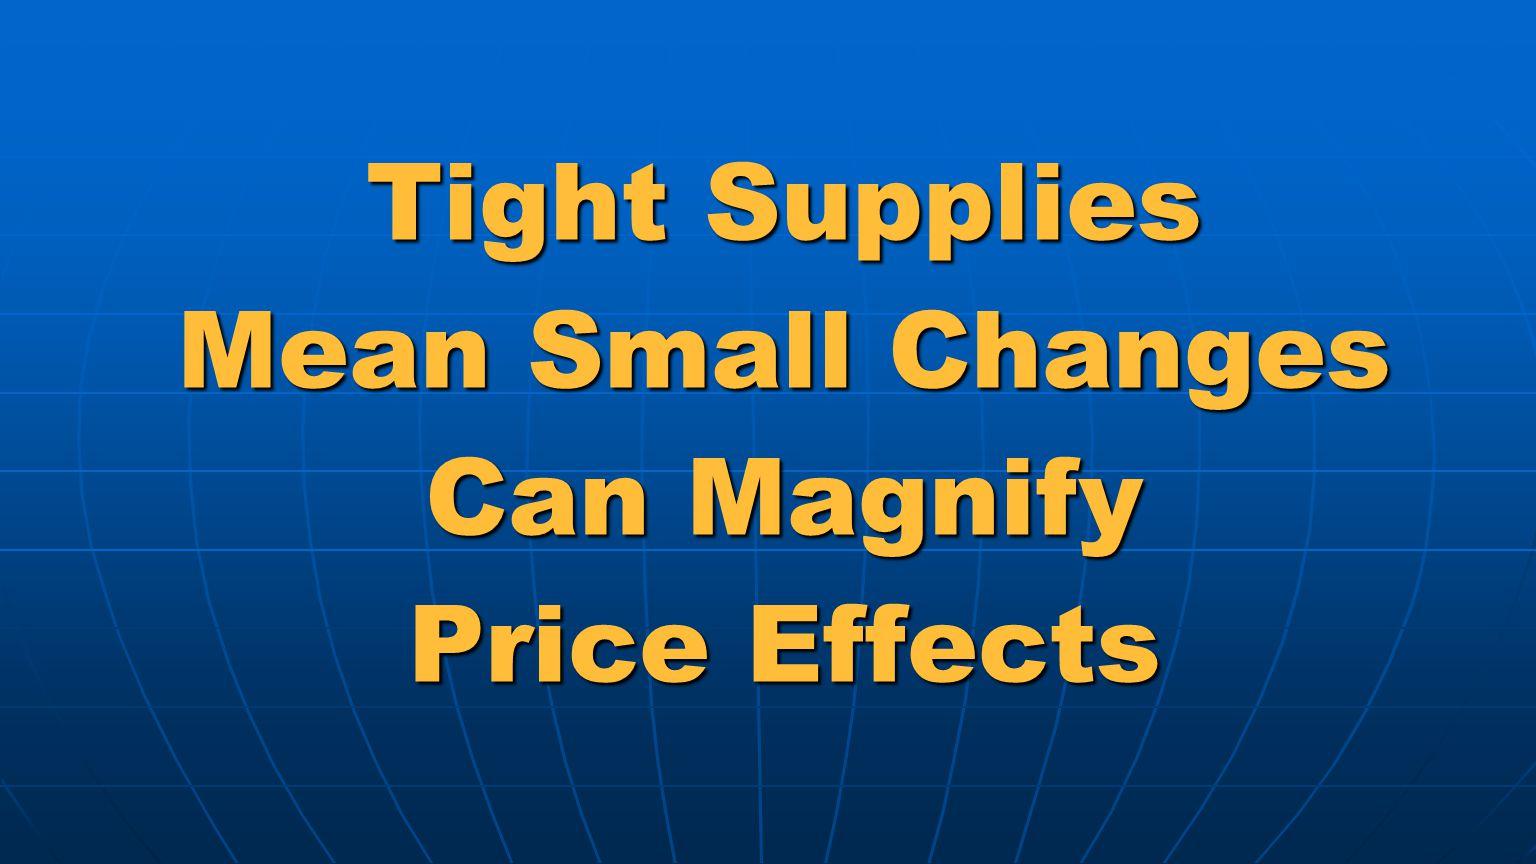 FERC Staff Will Rigorously Review: Supply Adequacy Supply Adequacy Trading Trading Infrastructure Infrastructure Electric Markets Electric Markets